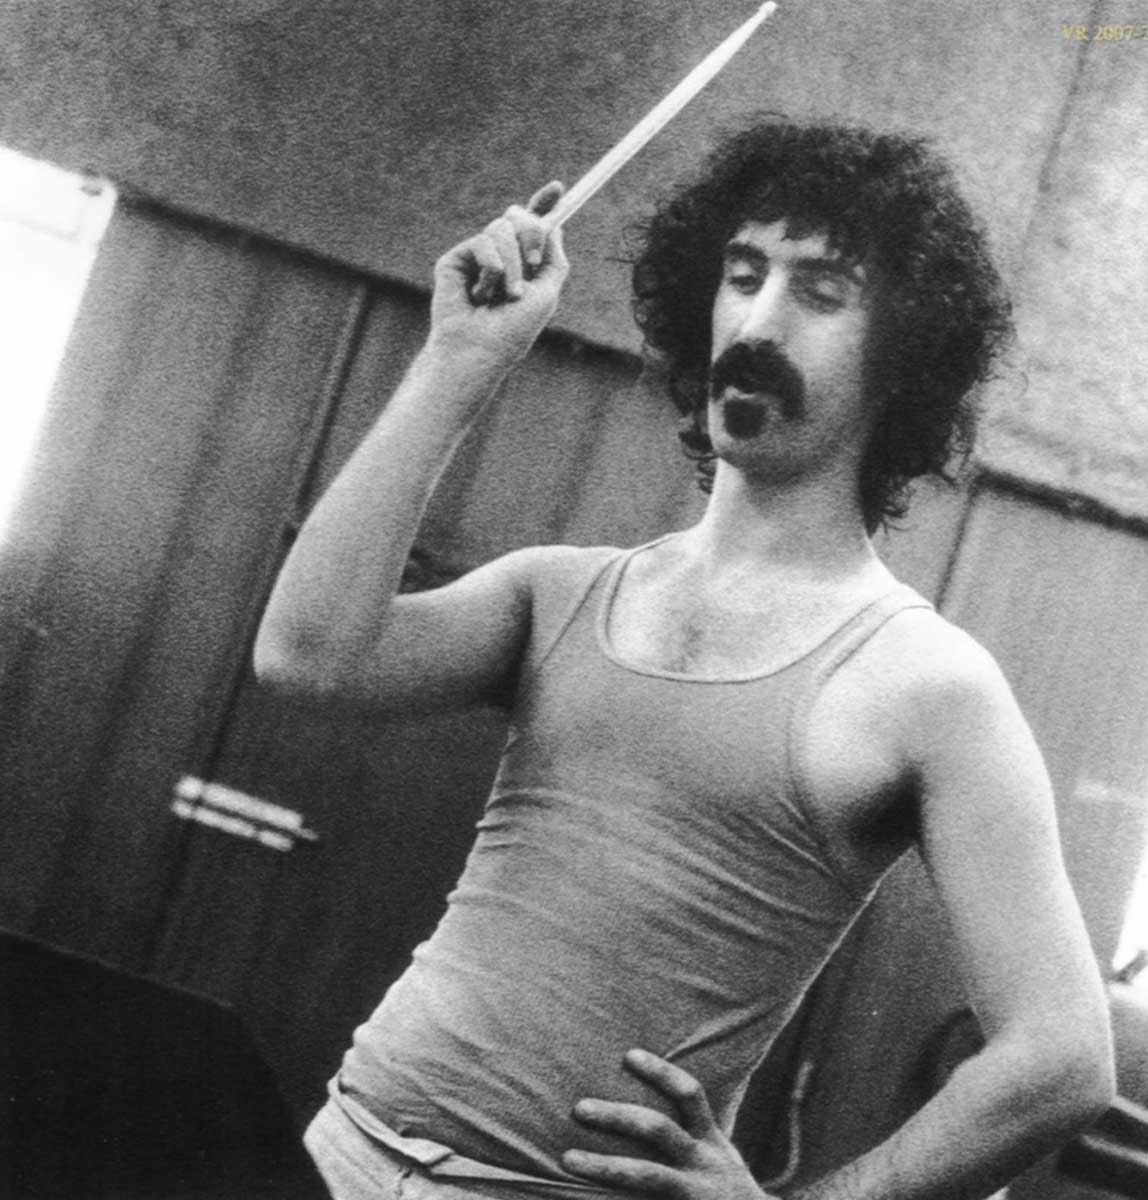 Frank Zappa drum